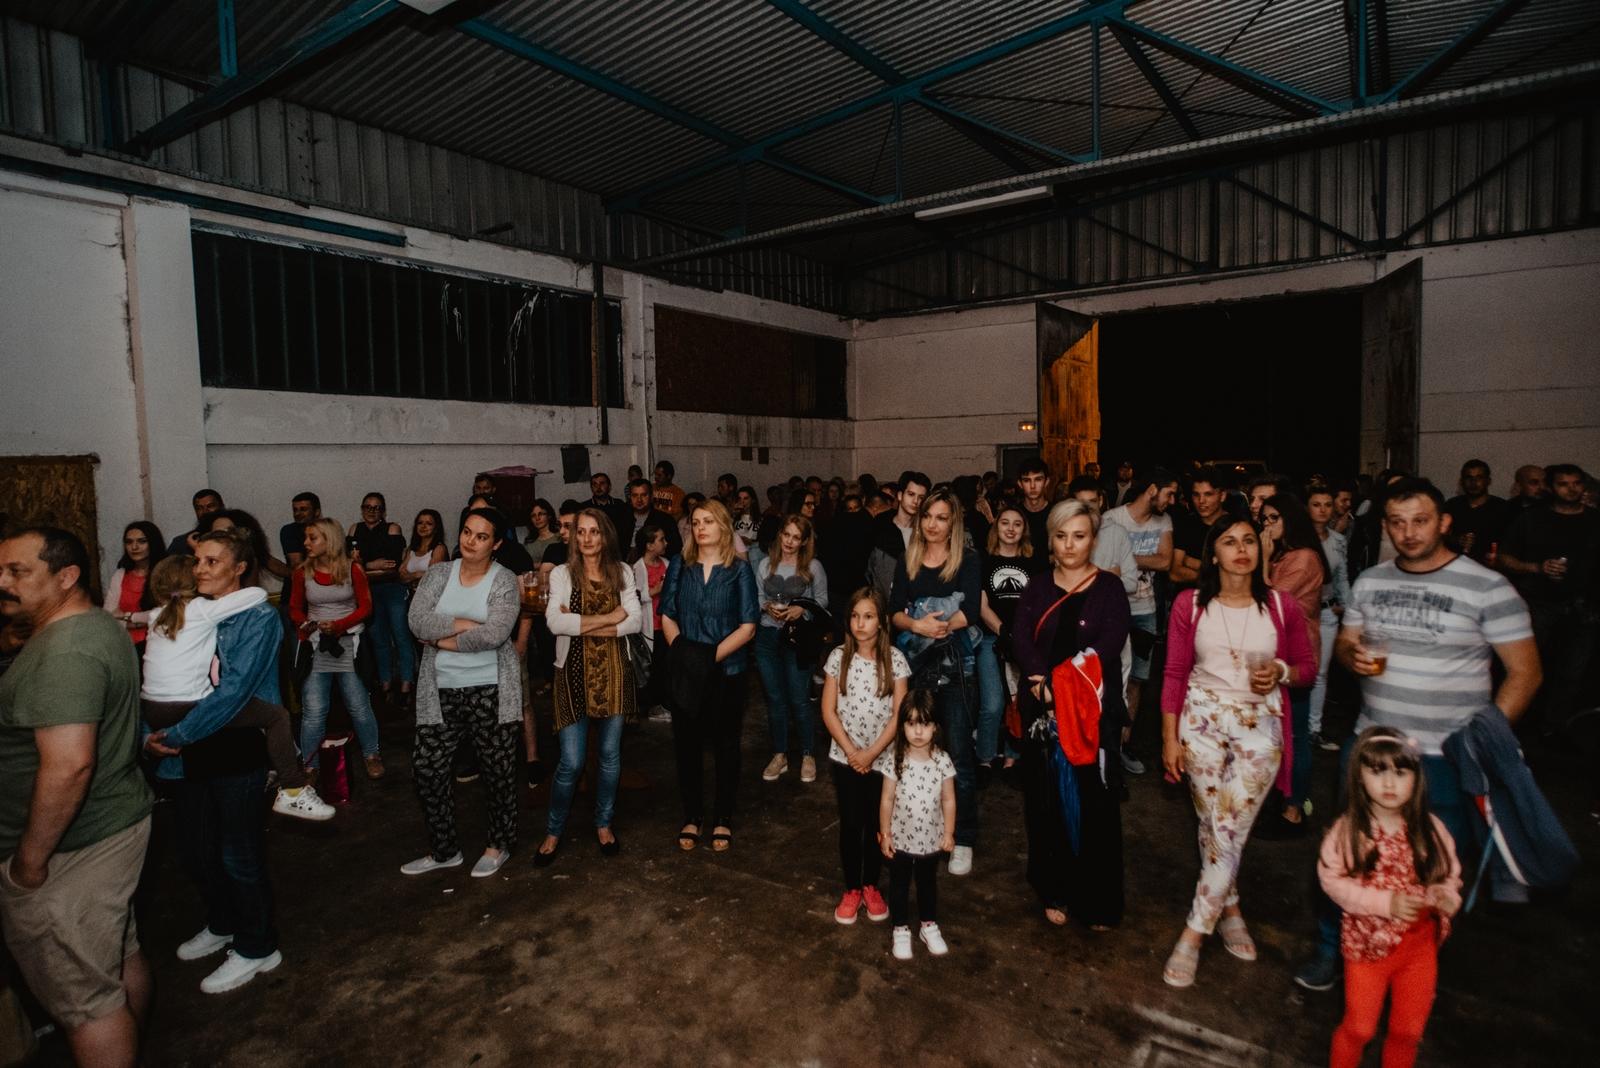 likaclub_korenica_neno-belan_2019-15